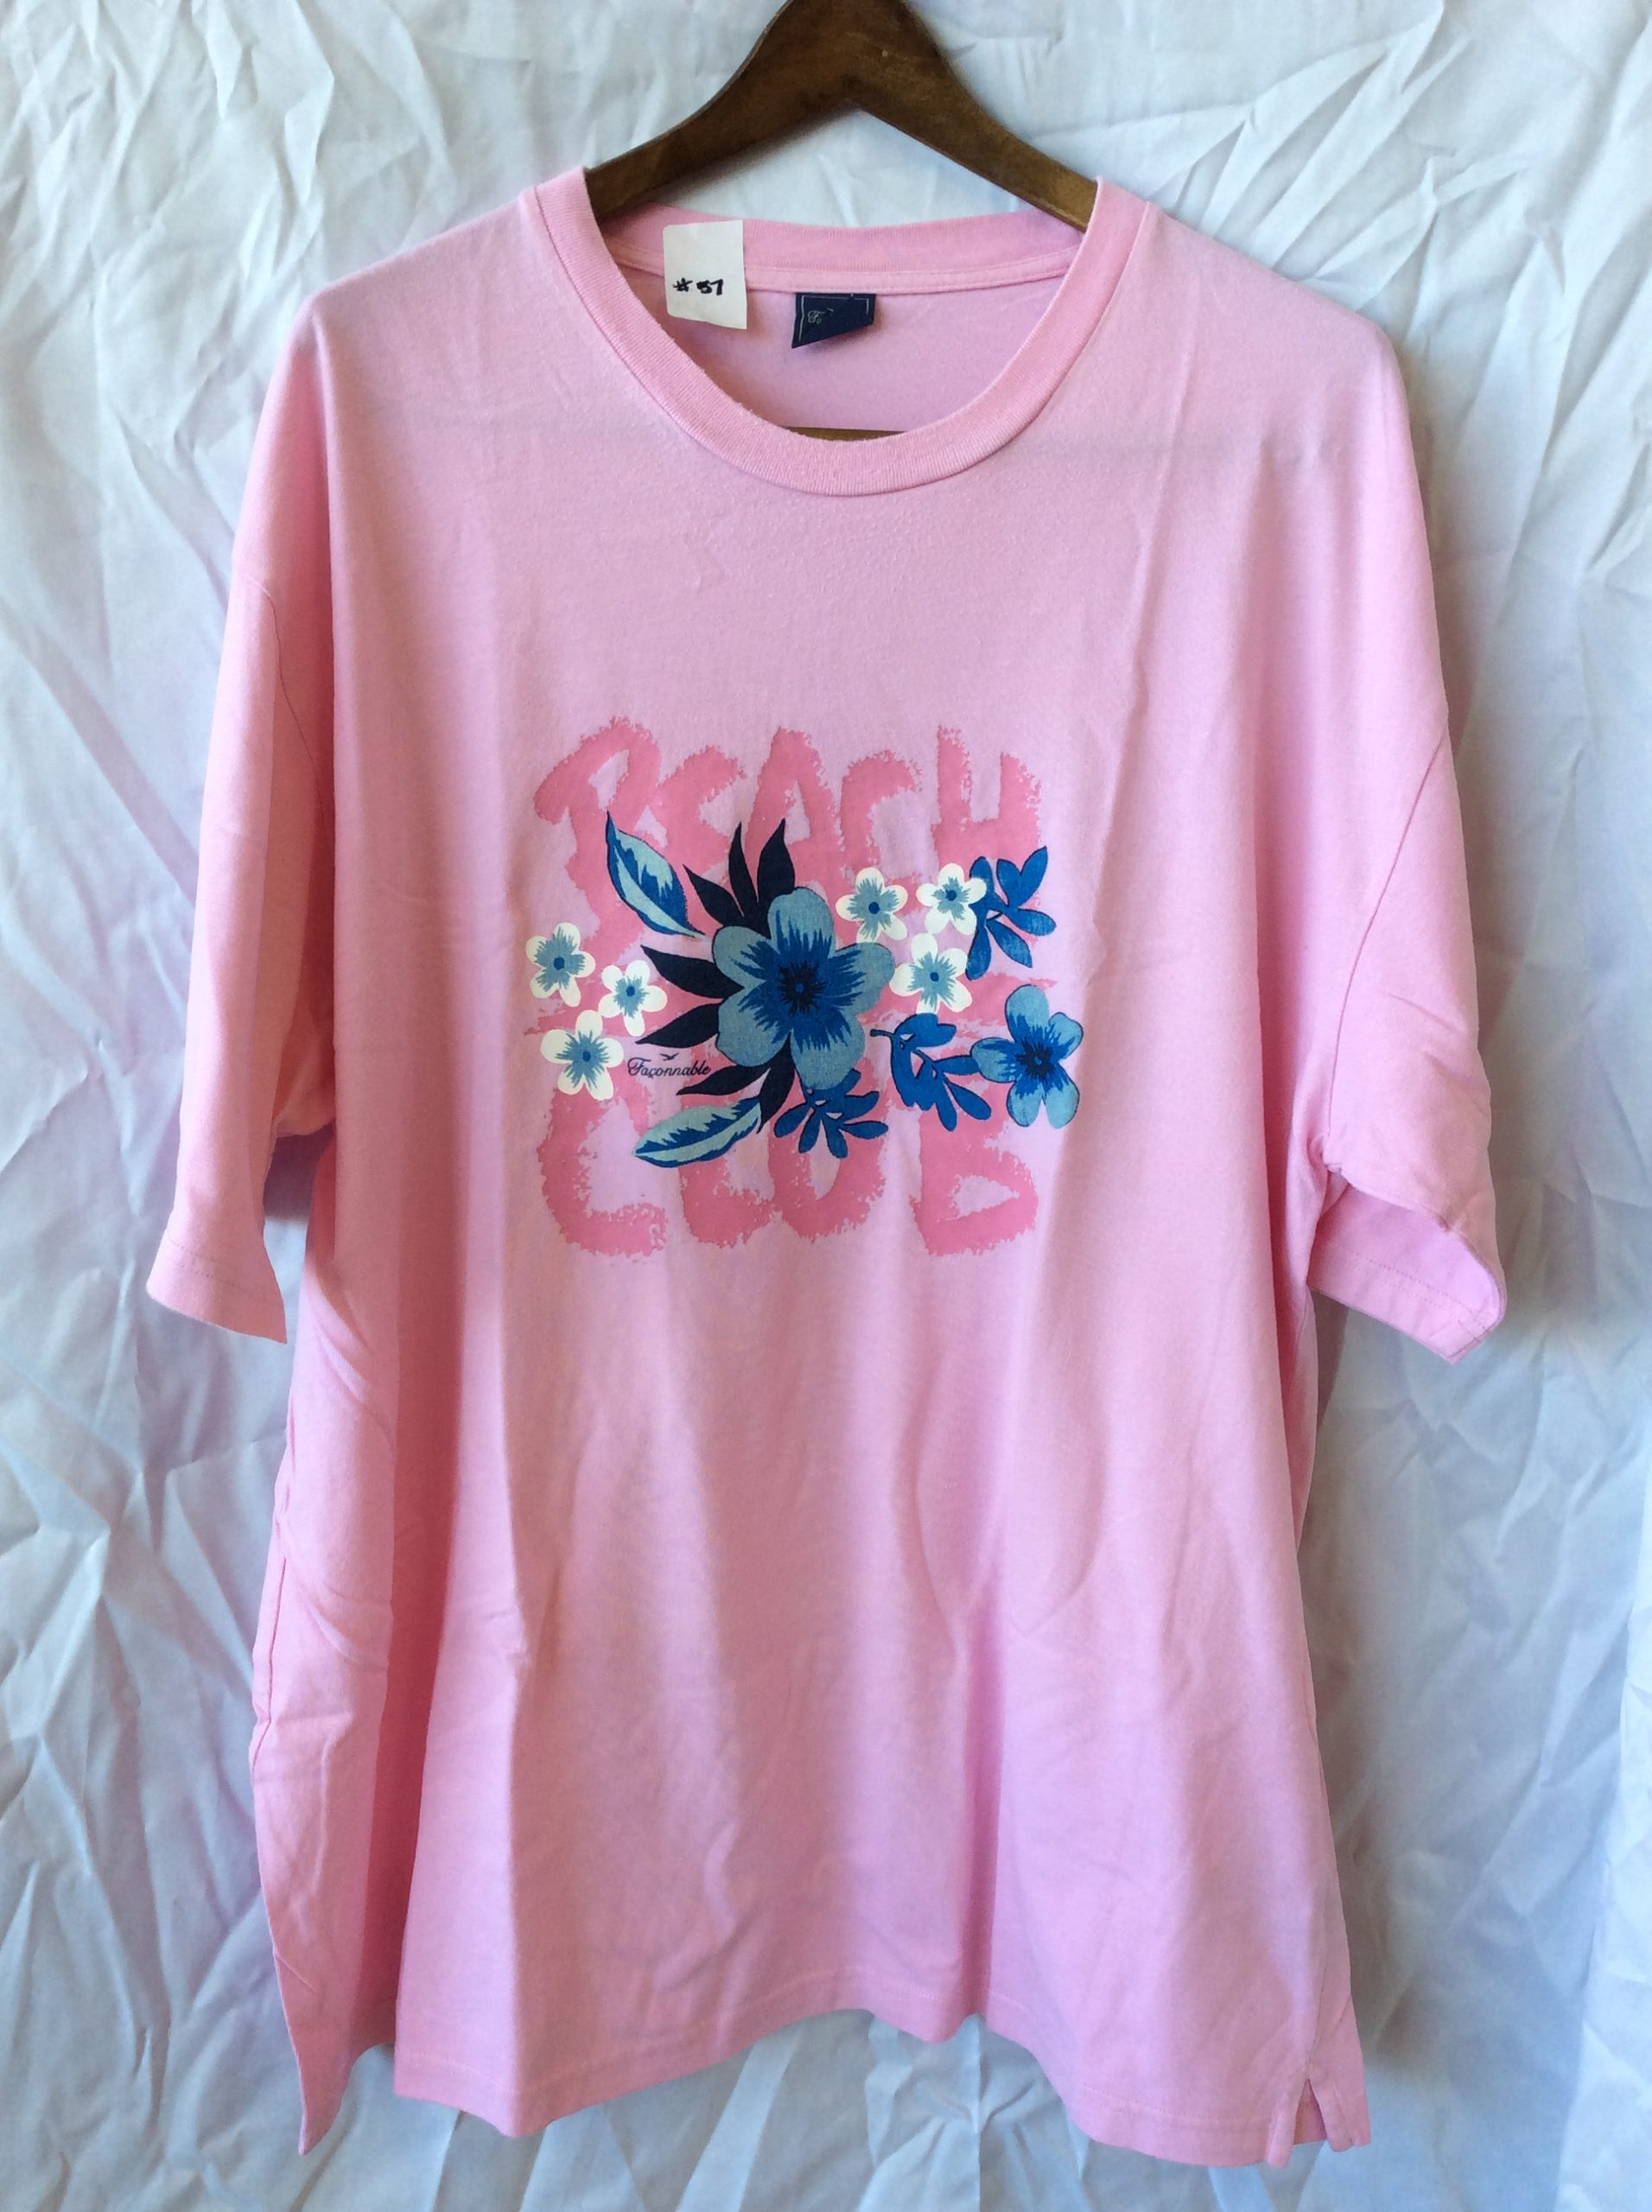 Women's (2 pack) t-shirts (one pink, one orange, size xxxl